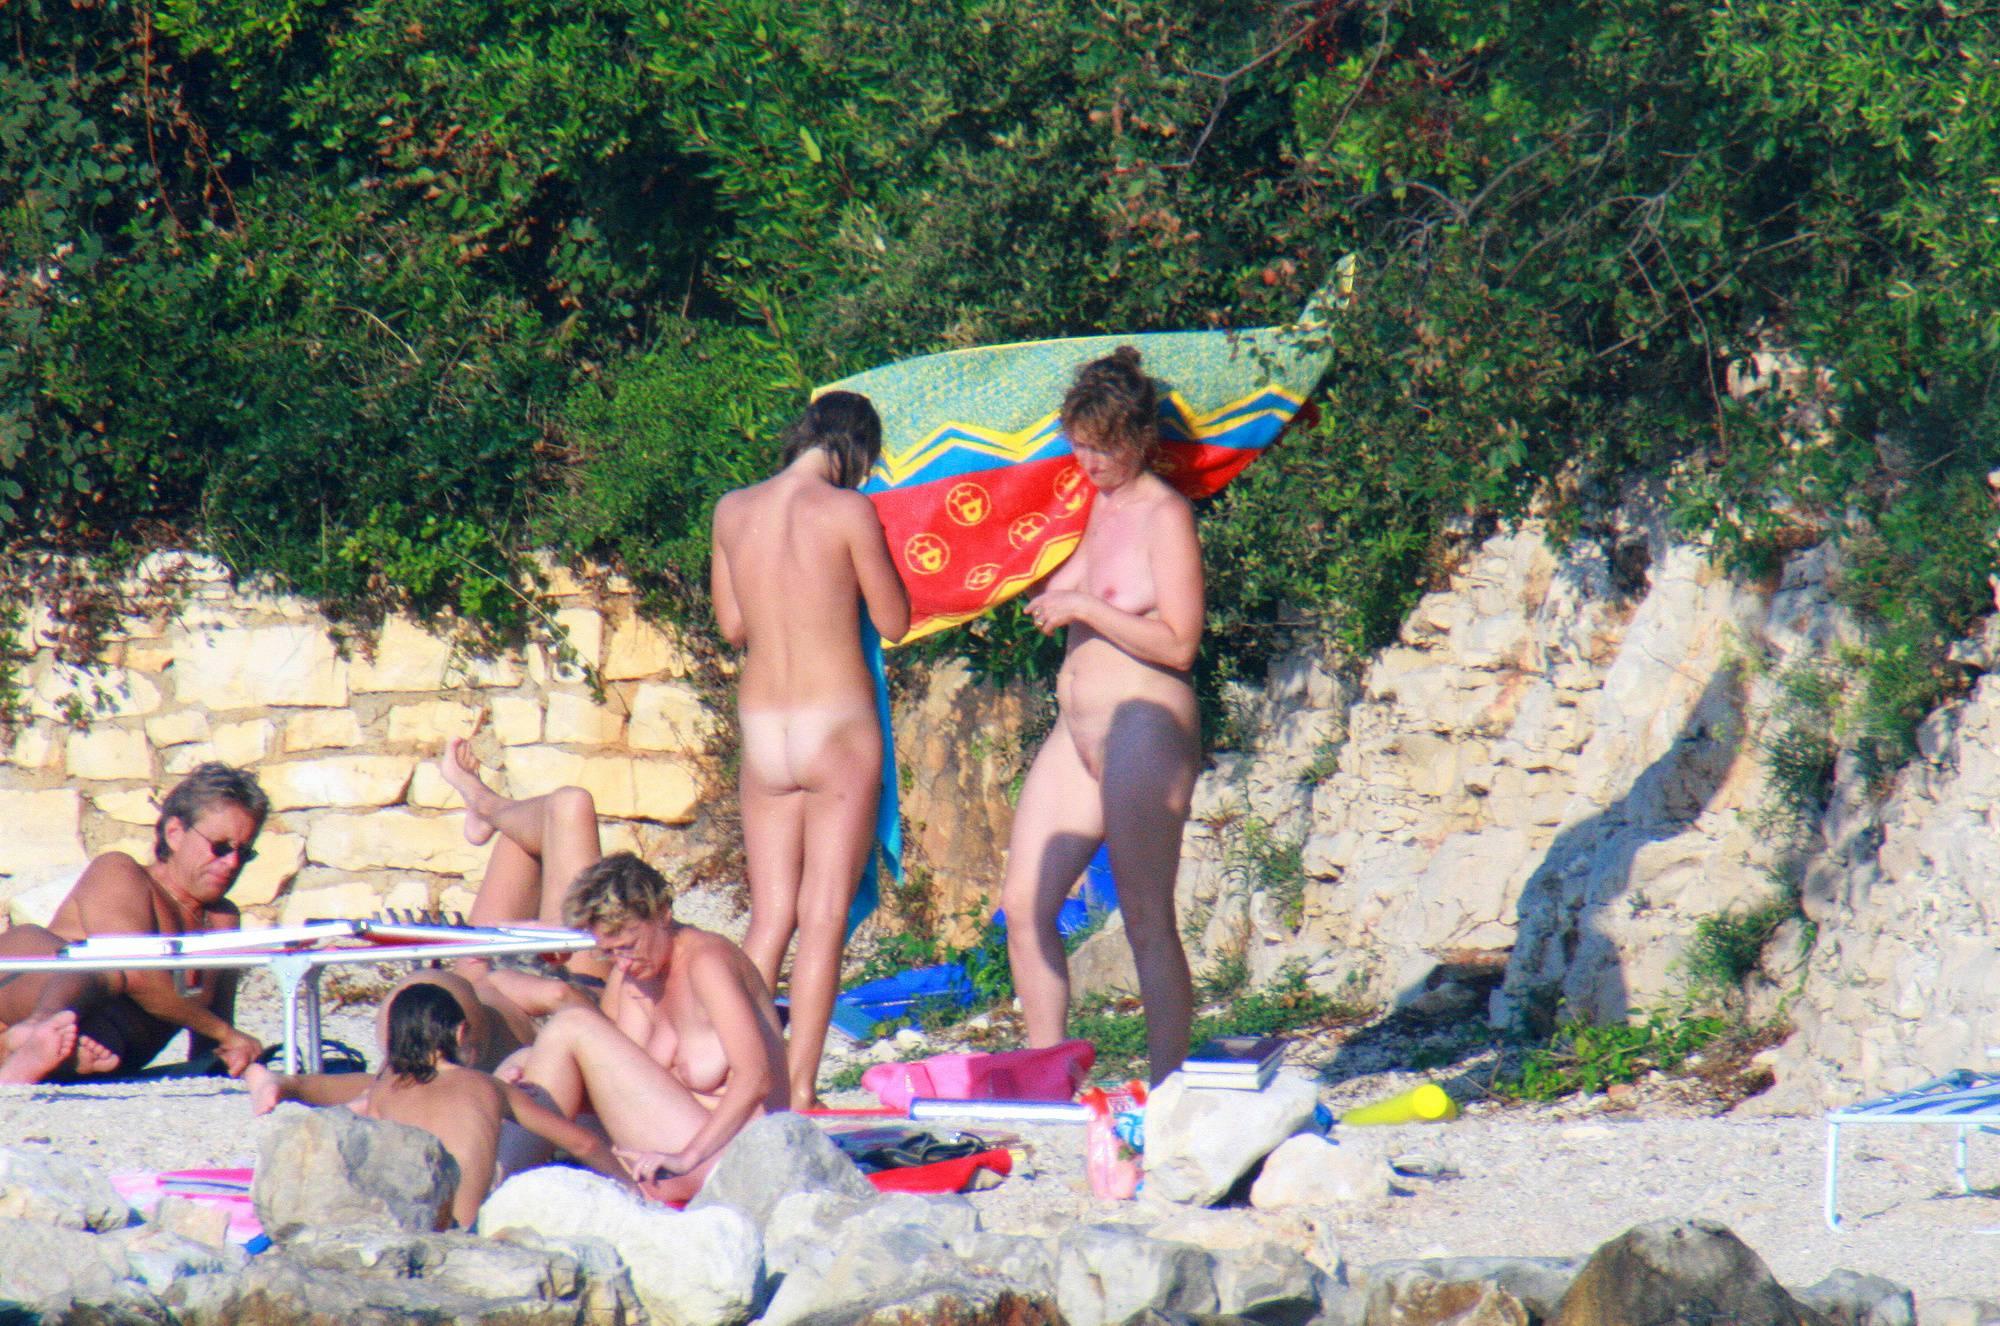 Purenudism Pics Ula FKK Beach Shorelines - 2